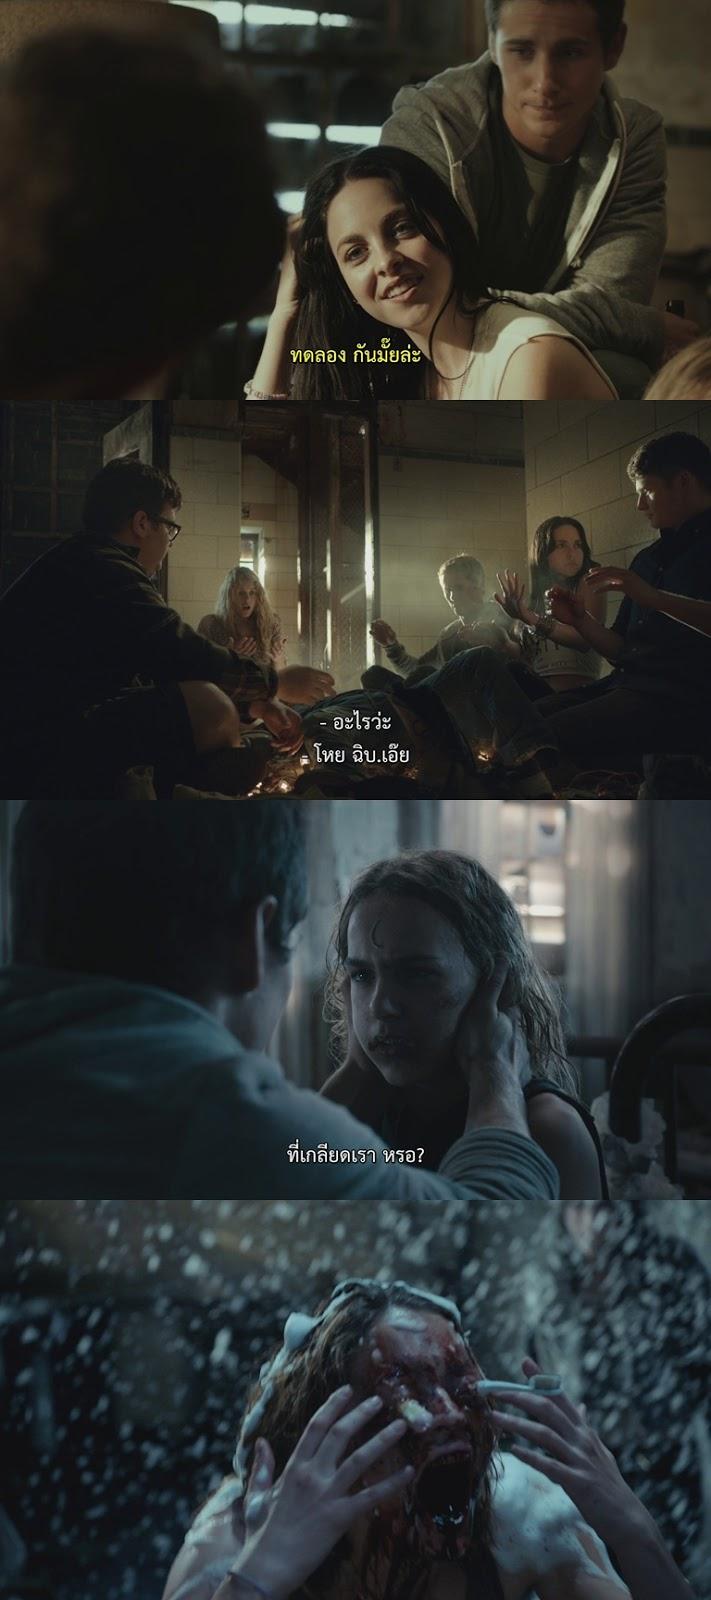 [MINI-HD] EXETER (2015) อย่าให้นรกสิง [1080P HQ] [SOUNDTRACK บรรยายไทย] ZAKKY-EXEXEX